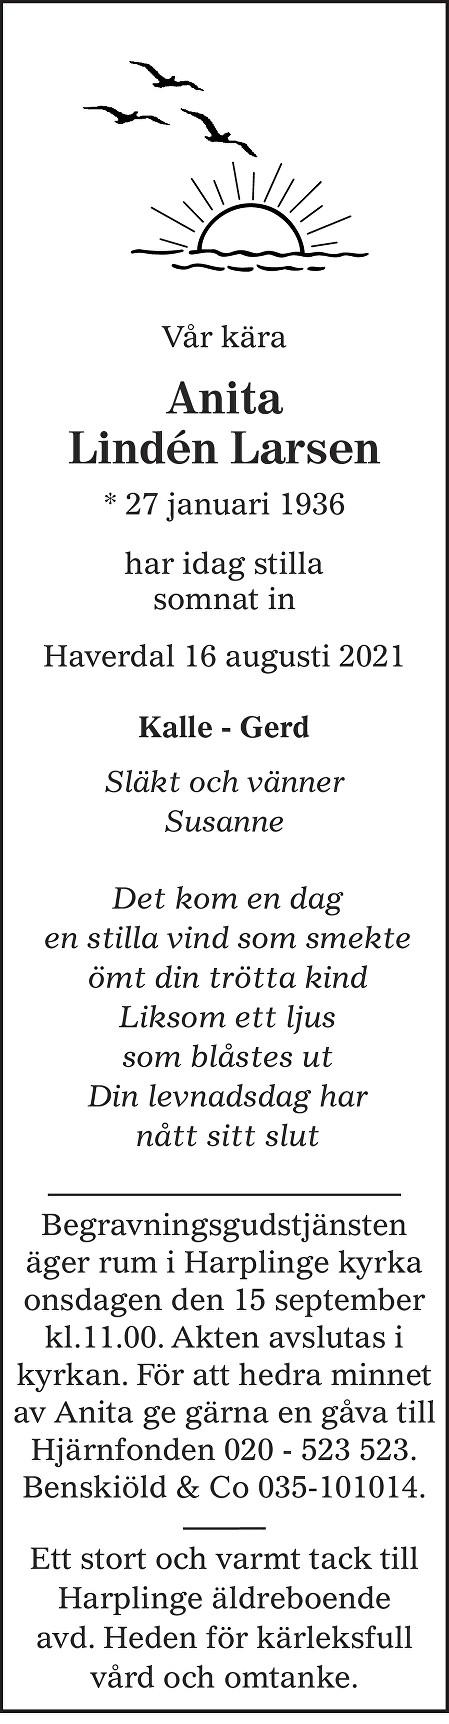 Anita Lindén Larsen Death notice